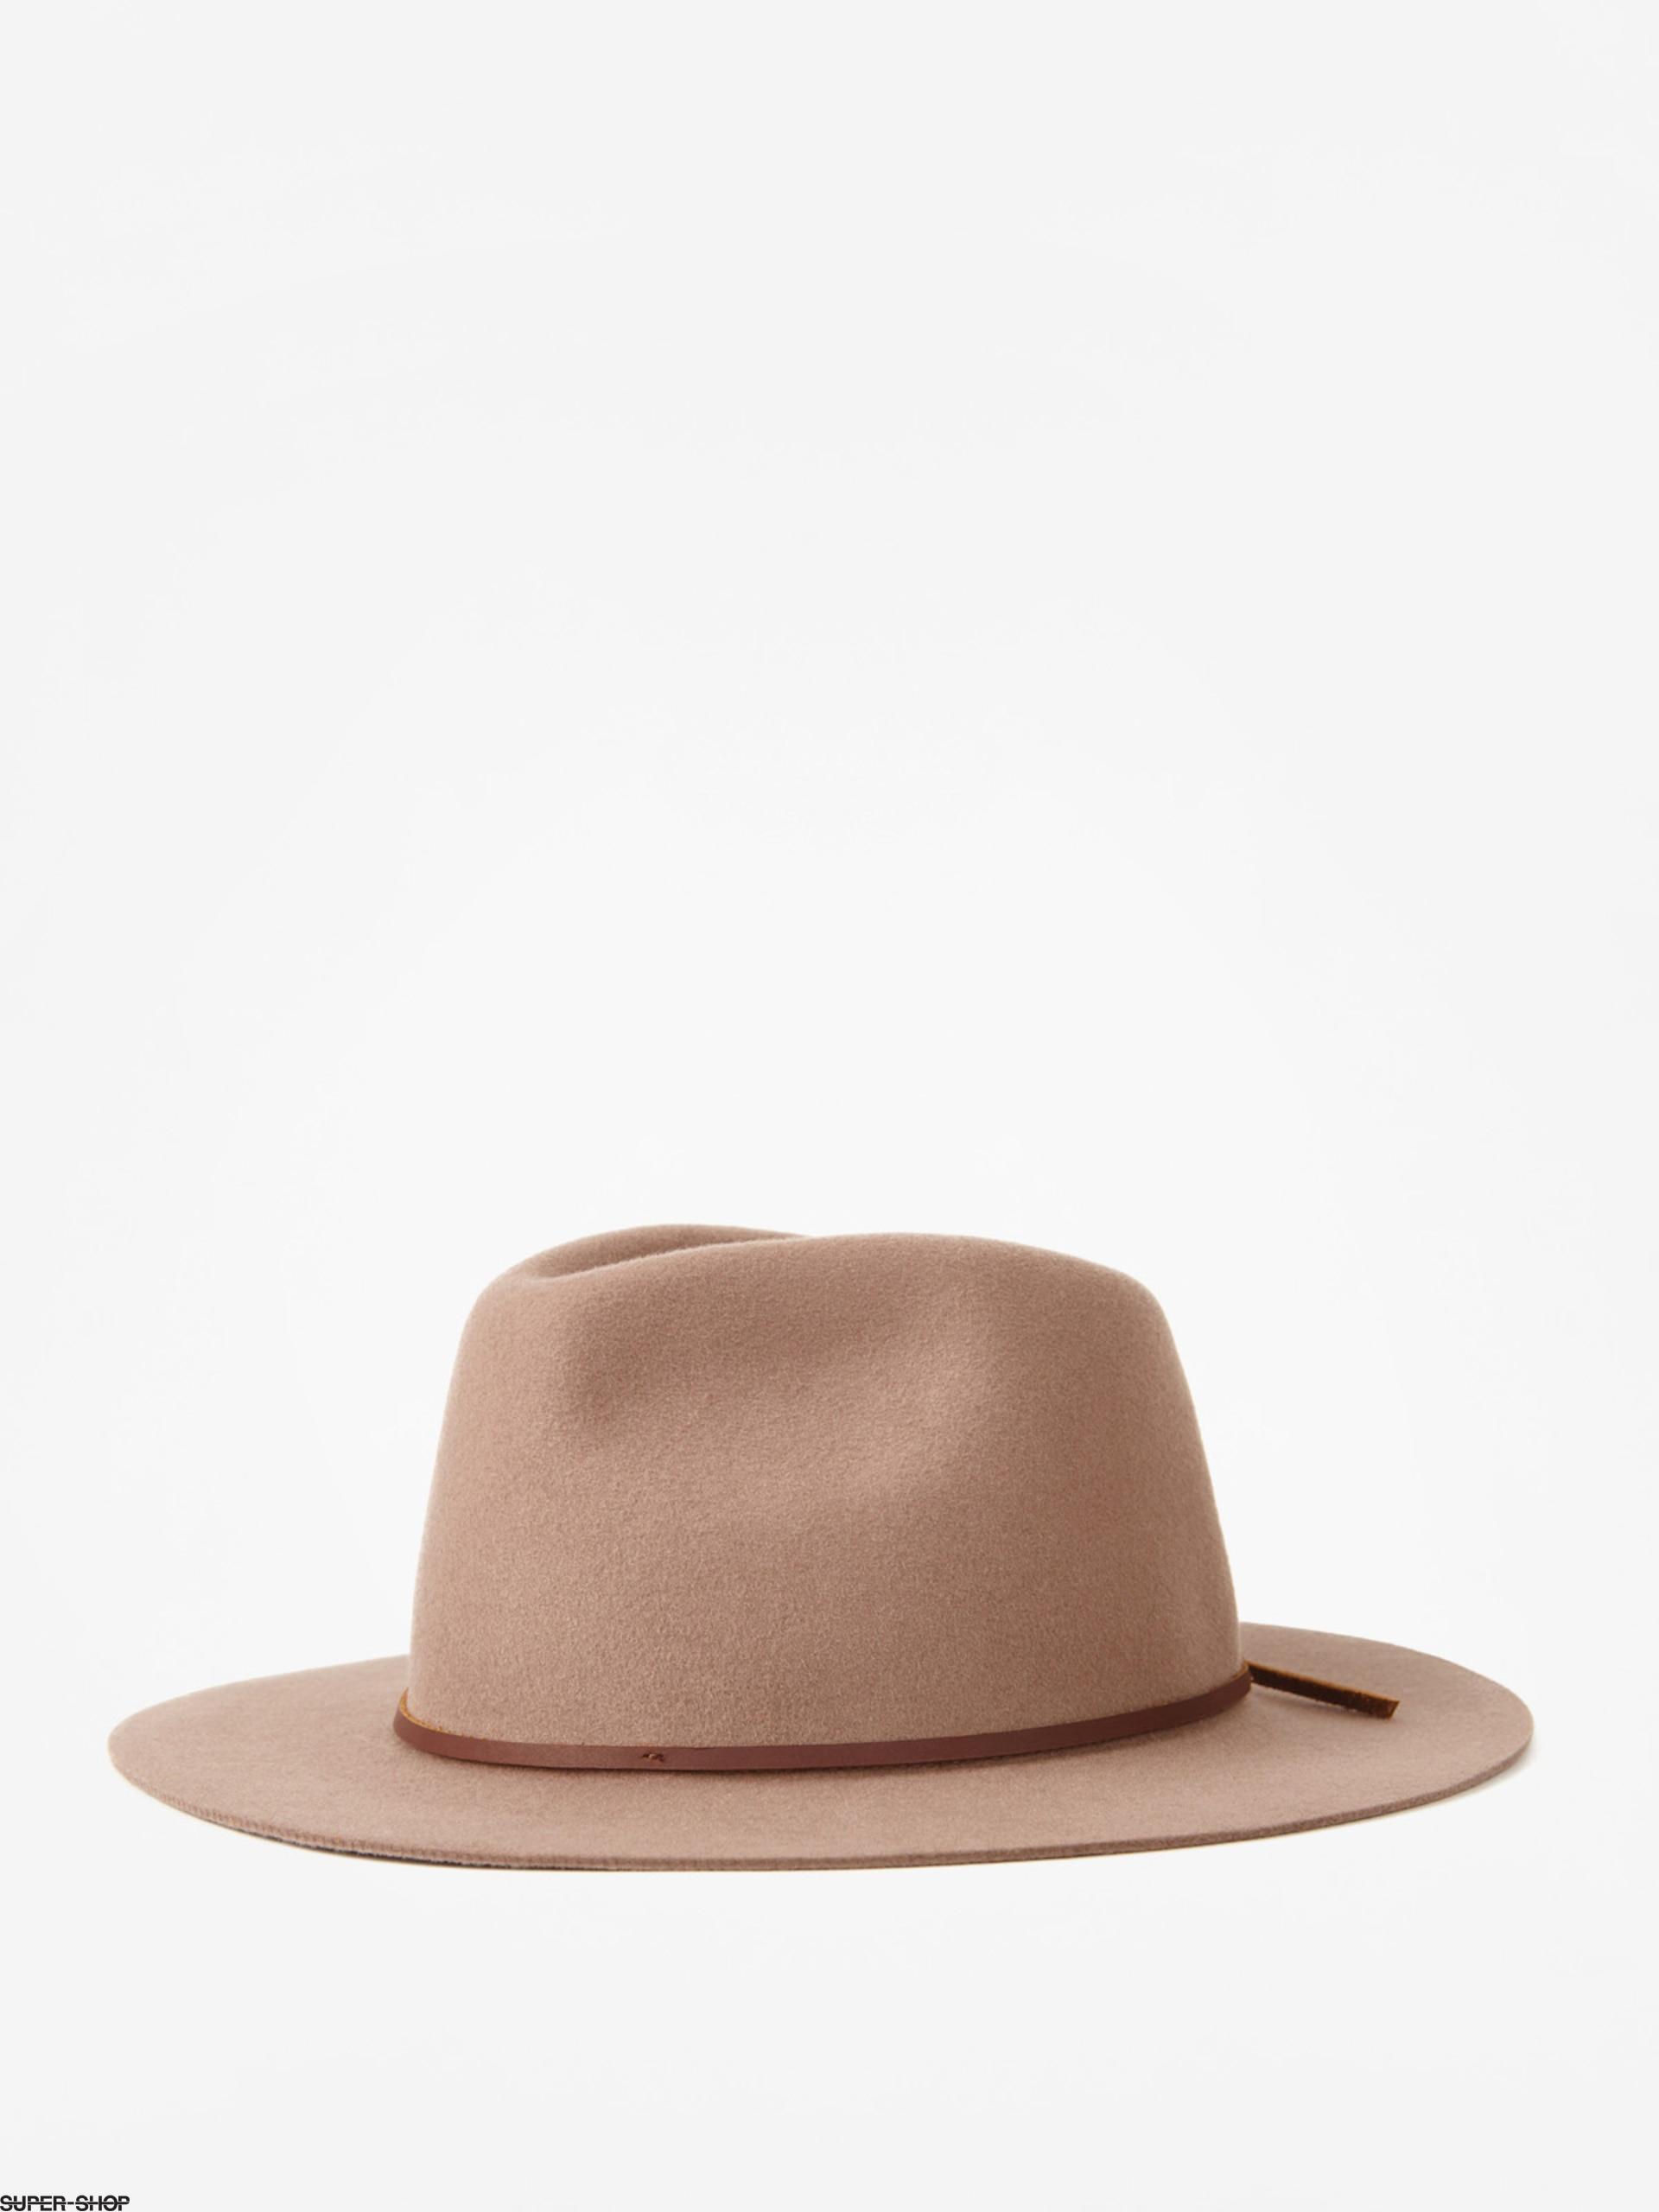 b45e445c0d7d2 966791-w1920-brixton-hat-wesley-fedora-sand.jpg